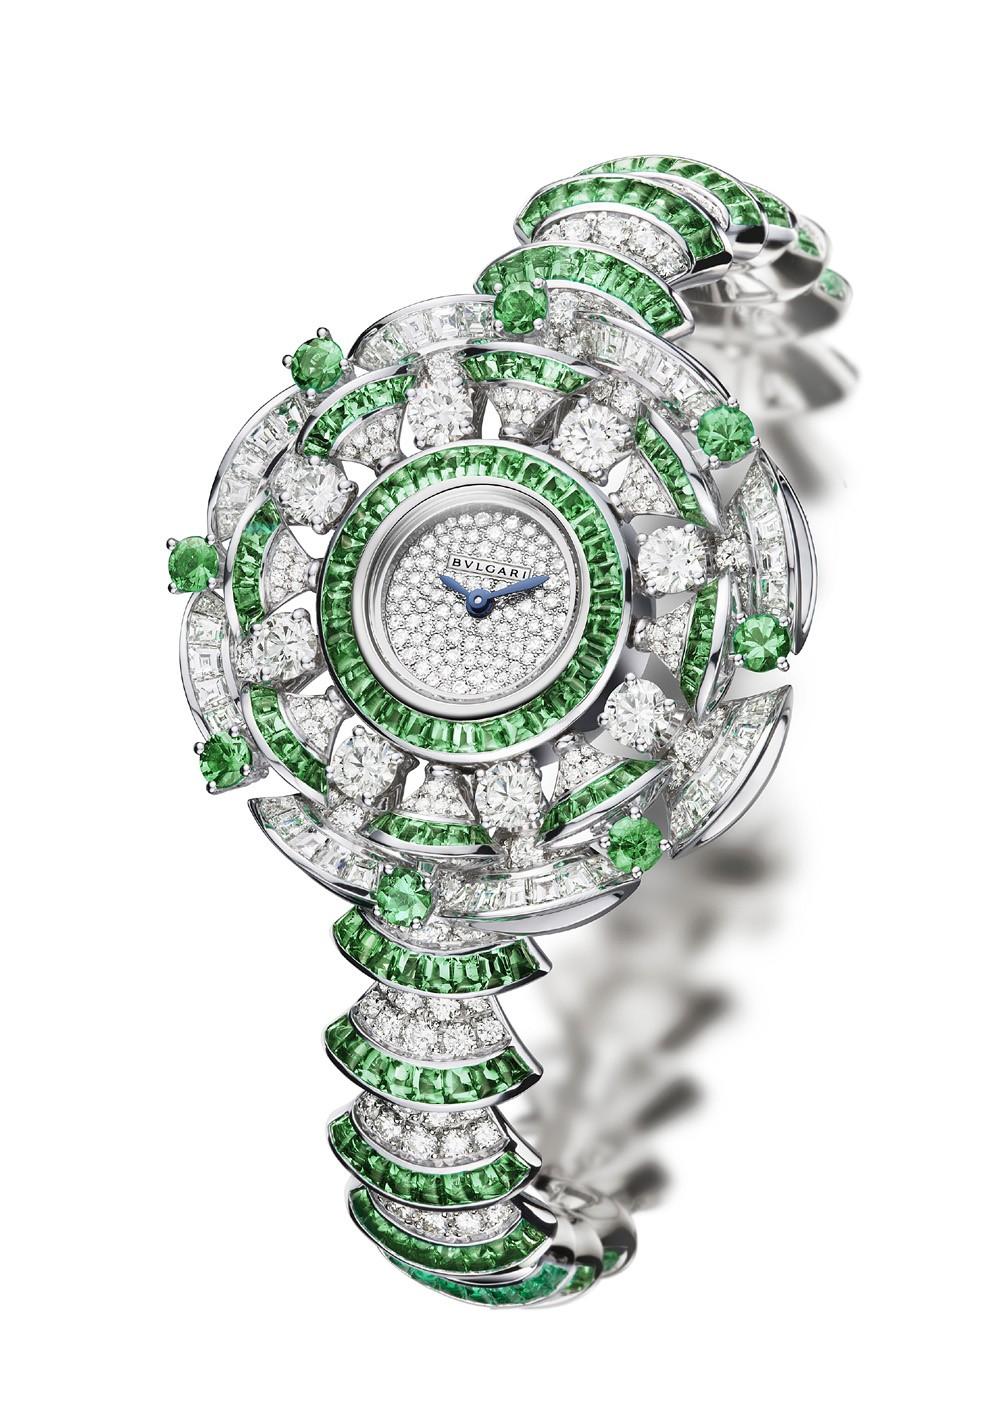 Pre-BaselWorld 2014   La collection horlogère Diva par Bulgari ... 99dbddc305c